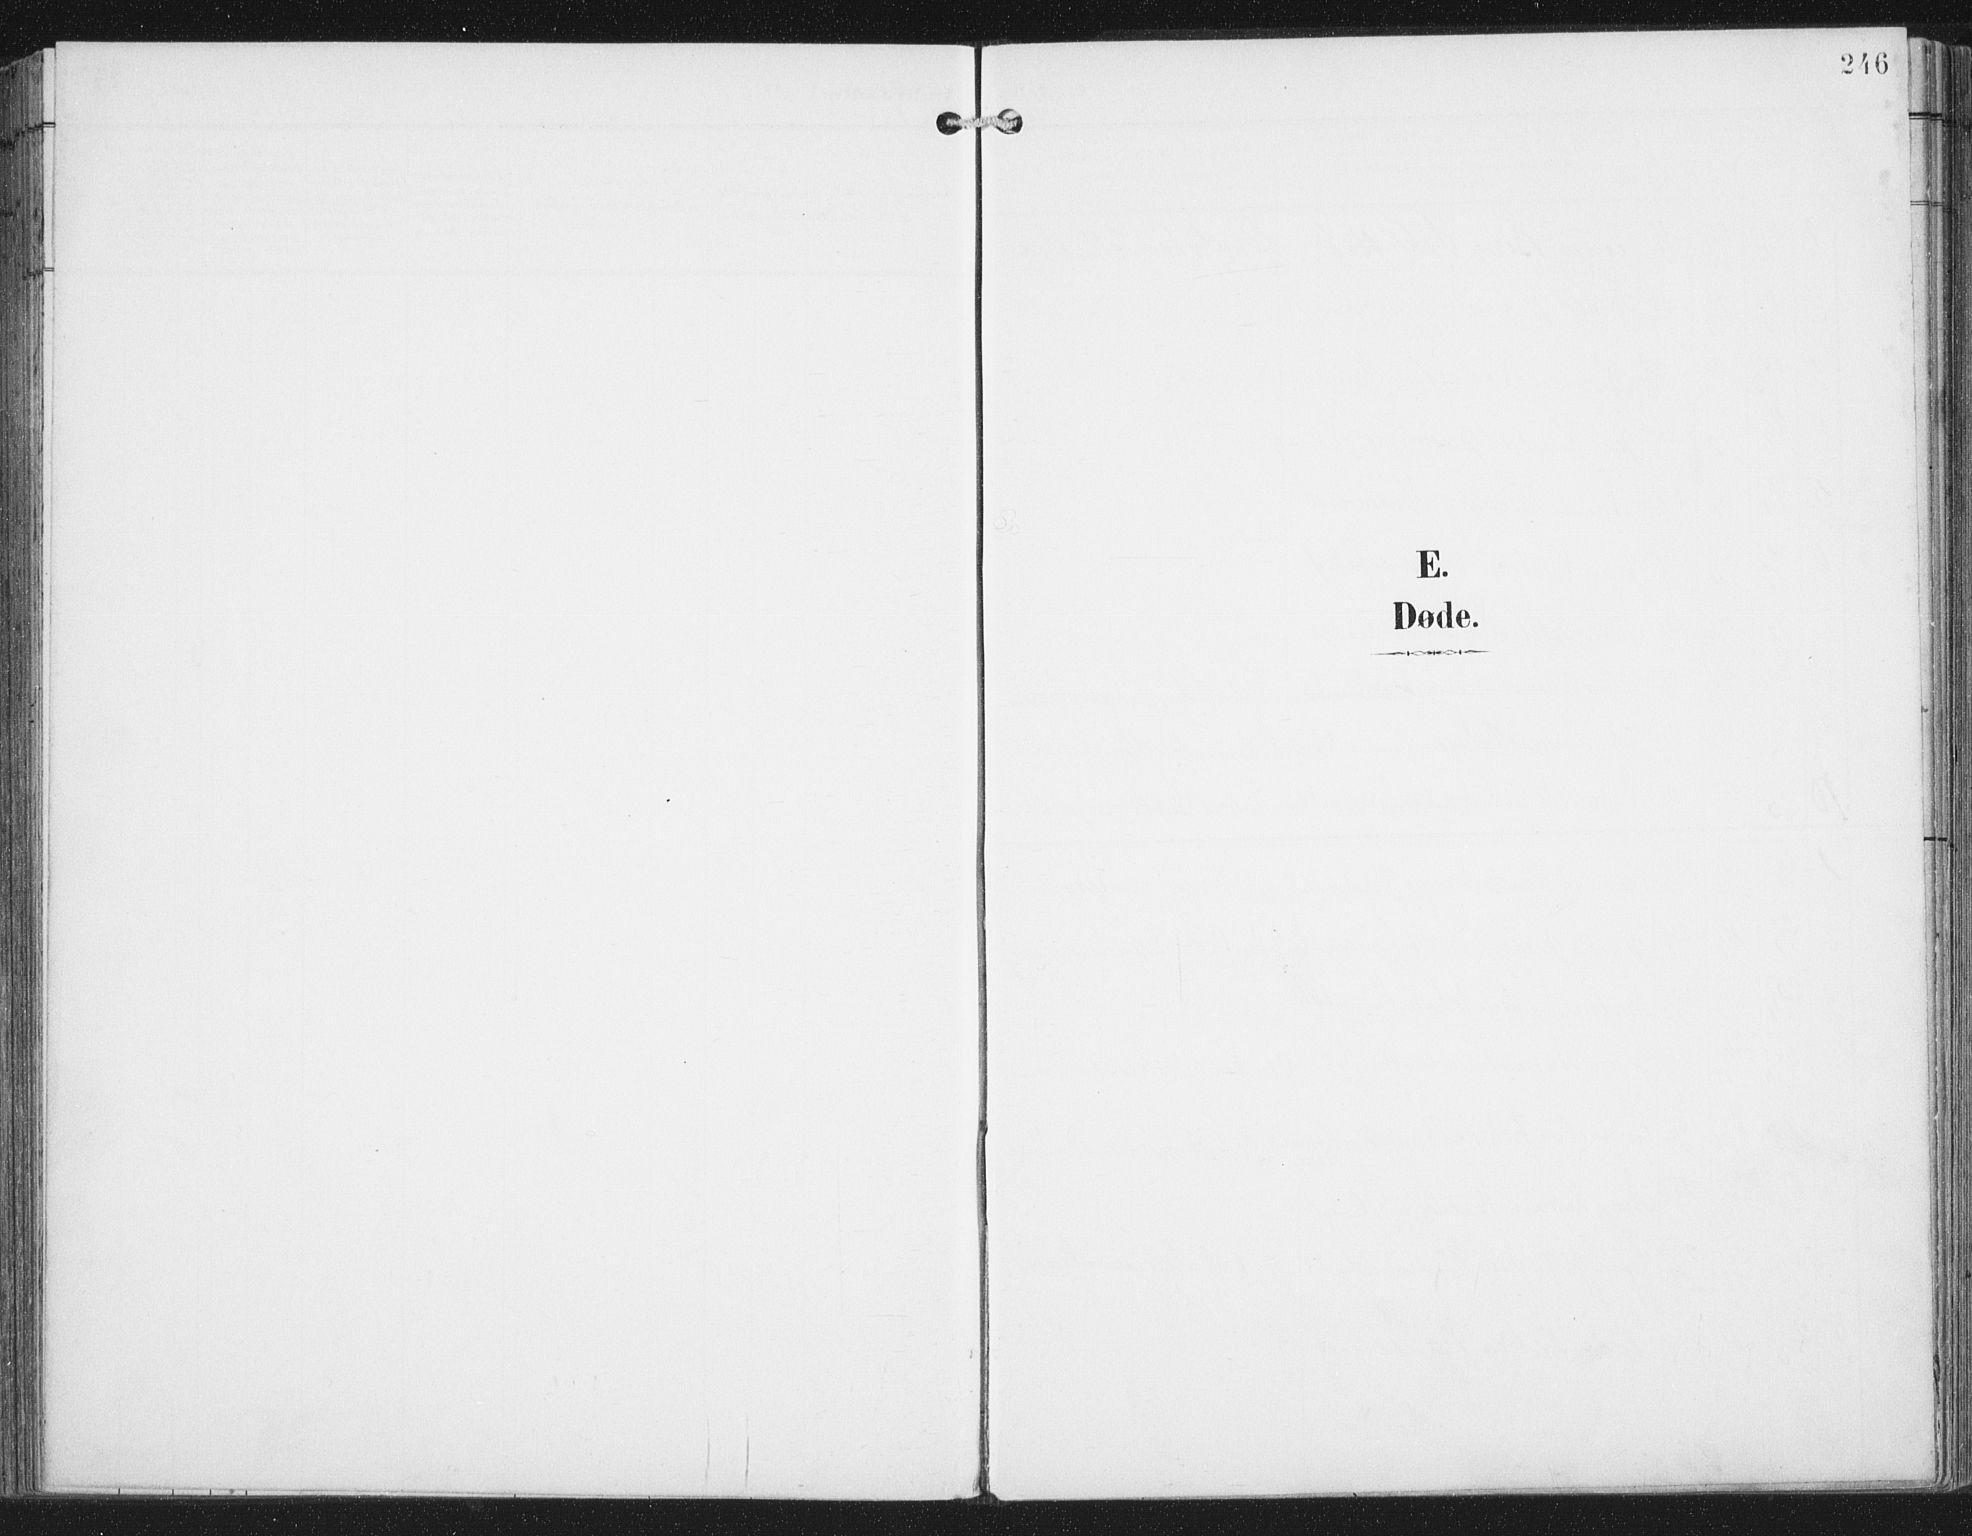 SAT, Ministerialprotokoller, klokkerbøker og fødselsregistre - Nordland, 876/L1098: Ministerialbok nr. 876A04, 1896-1915, s. 246